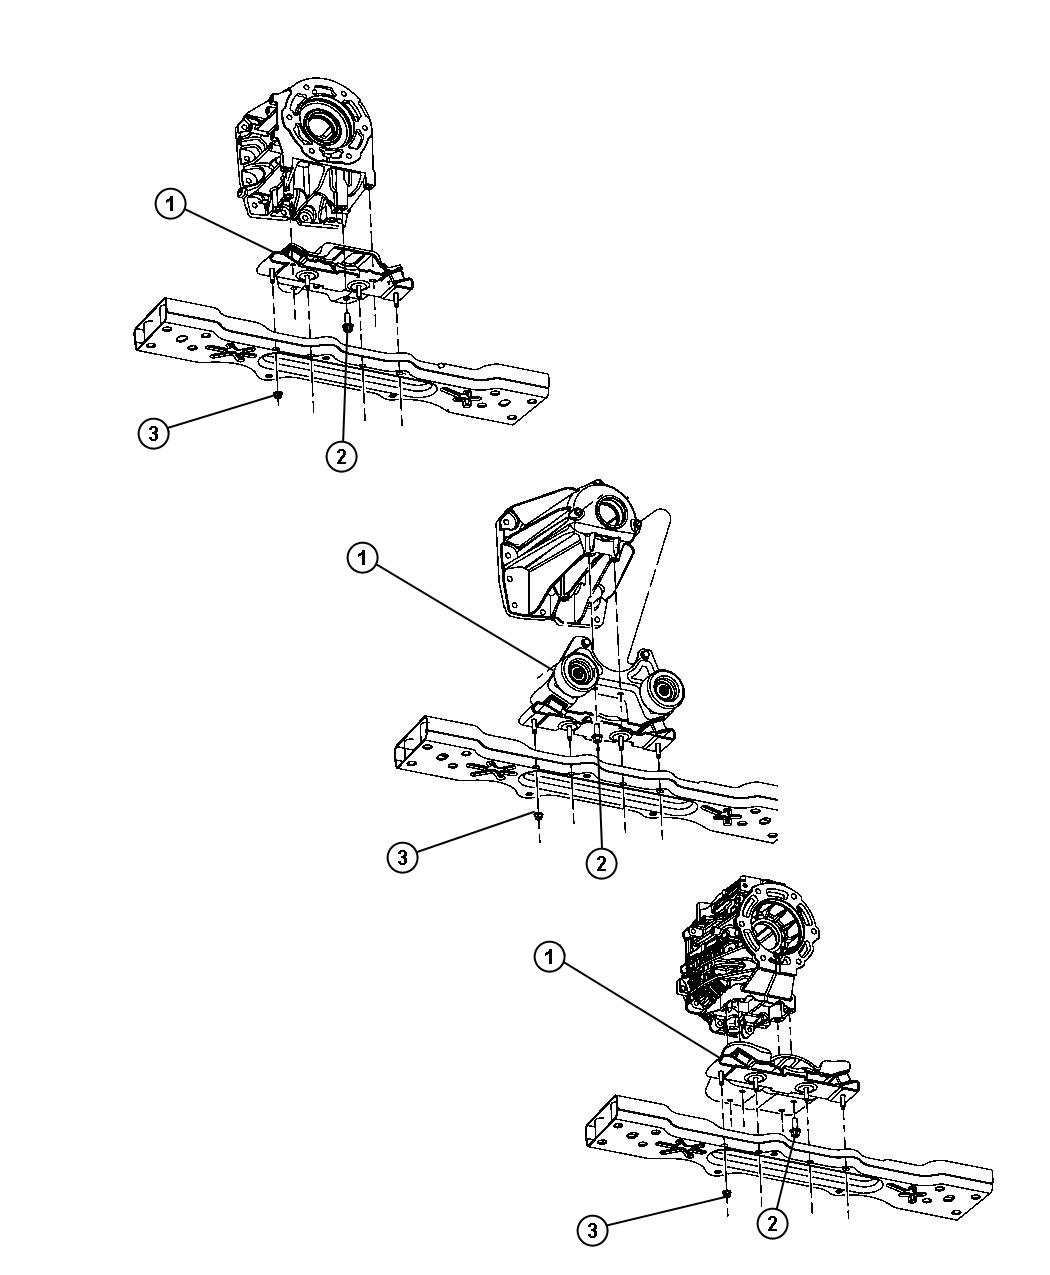 Transmision Parts Diagram Dodge Nitro Dodge Auto